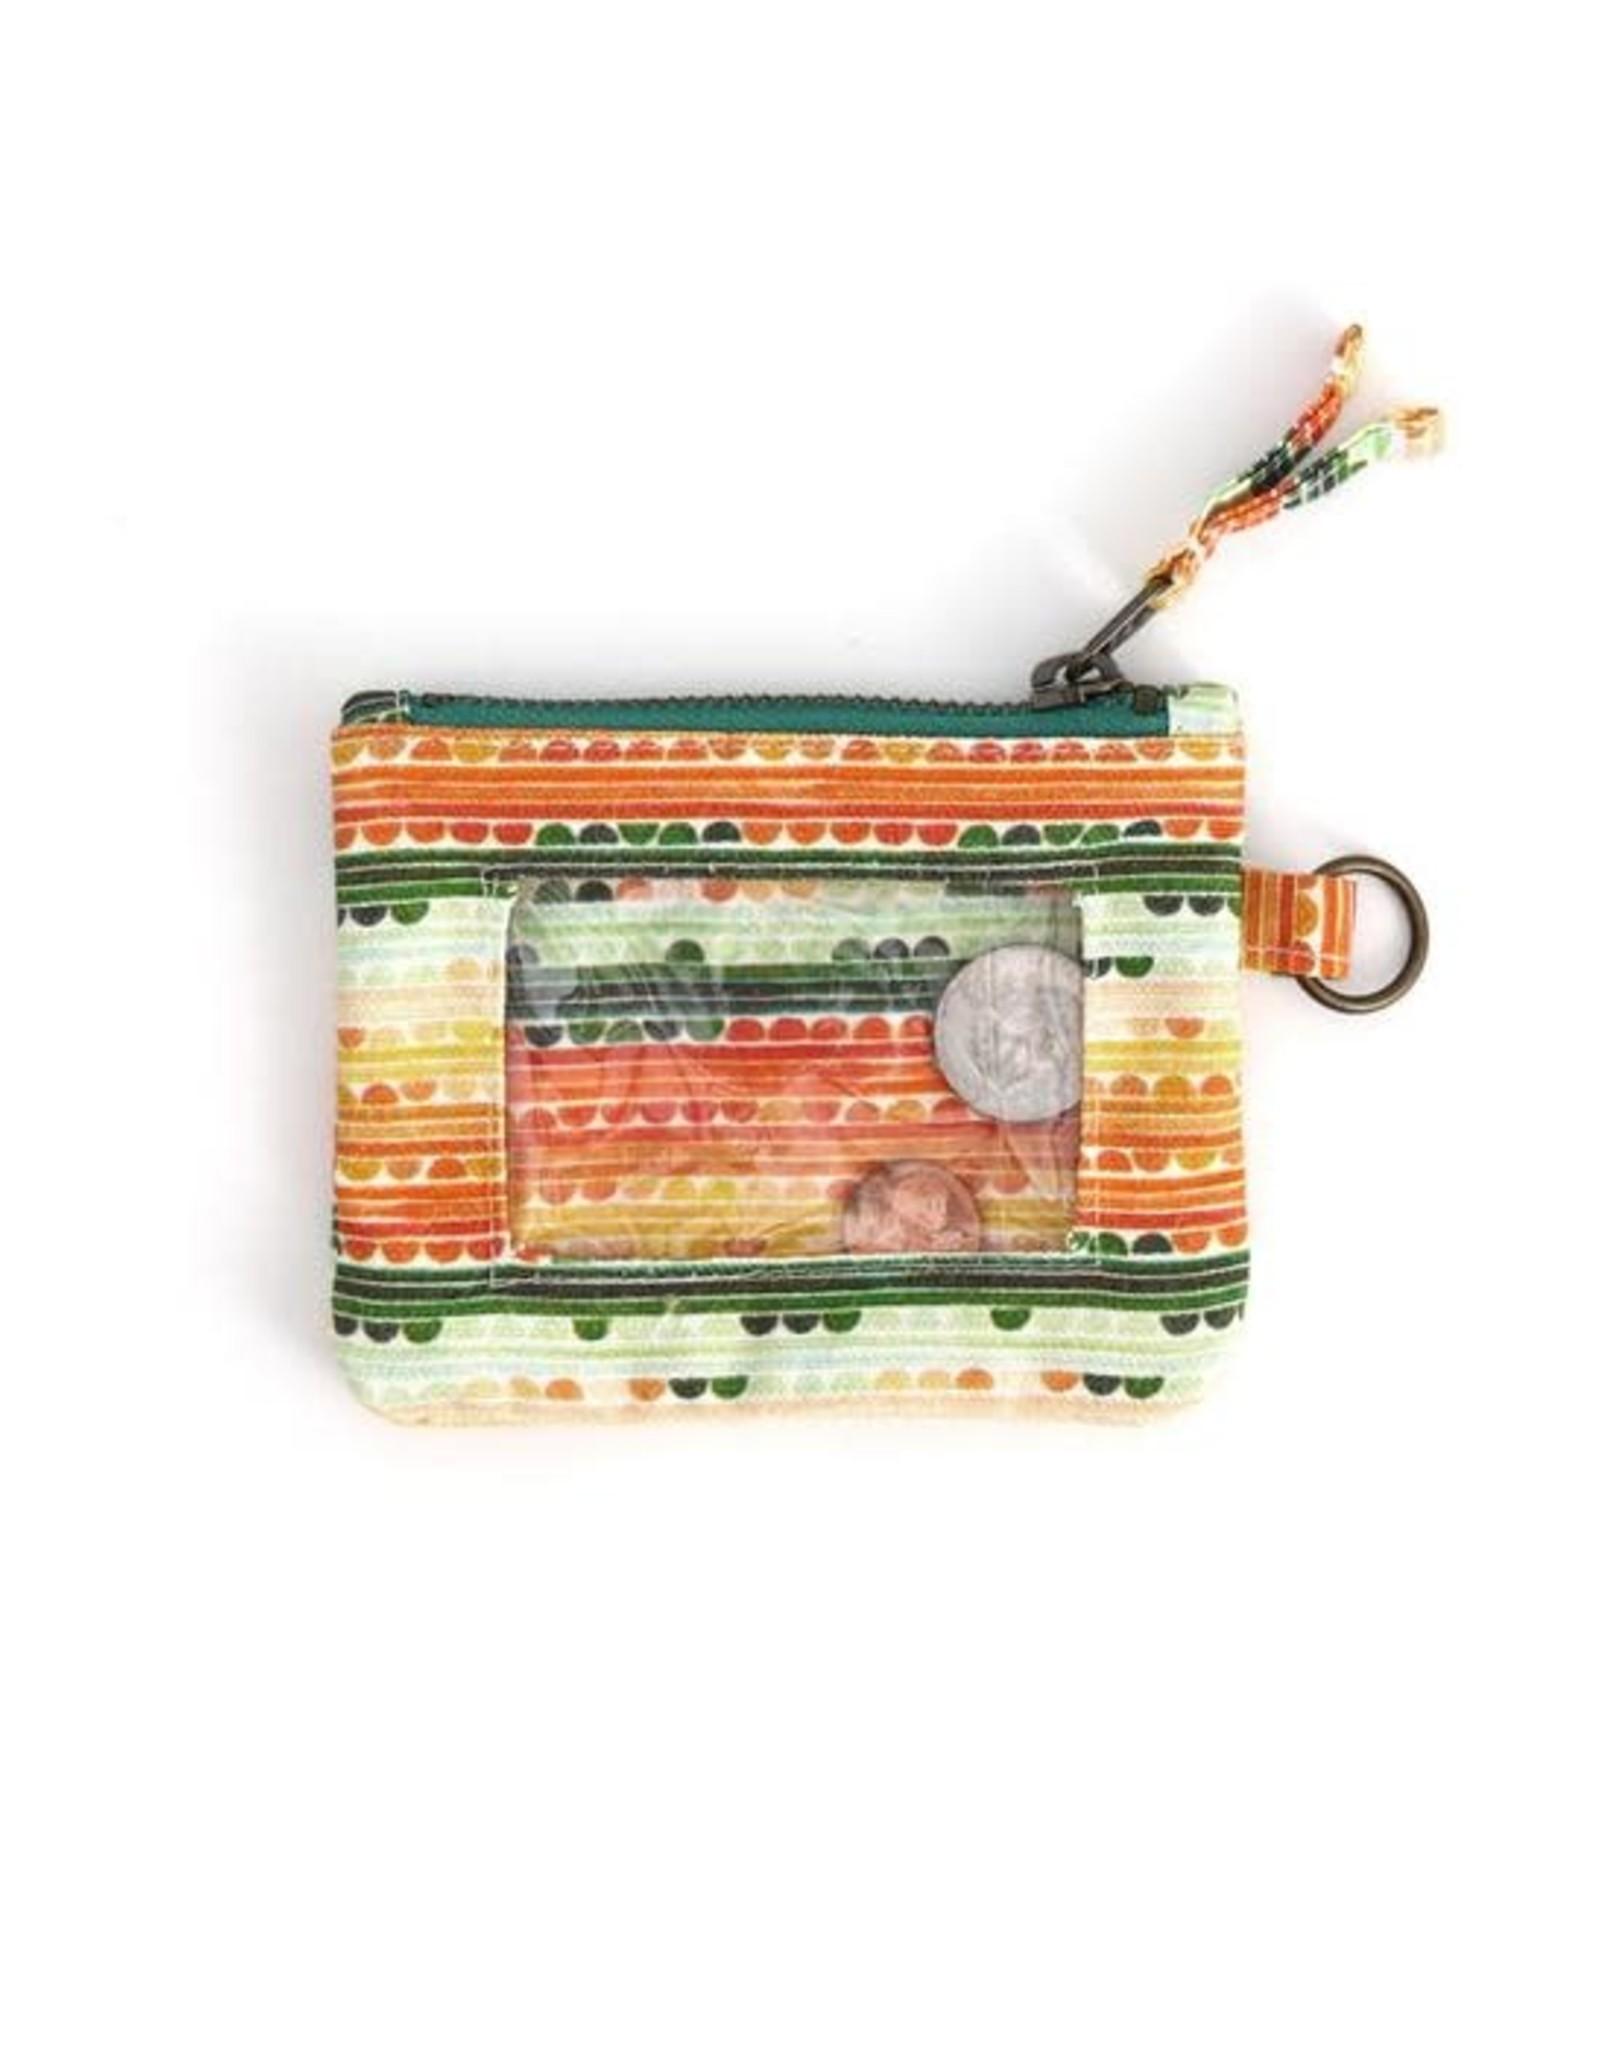 1Canoe2 1canoe2   ID Wallet